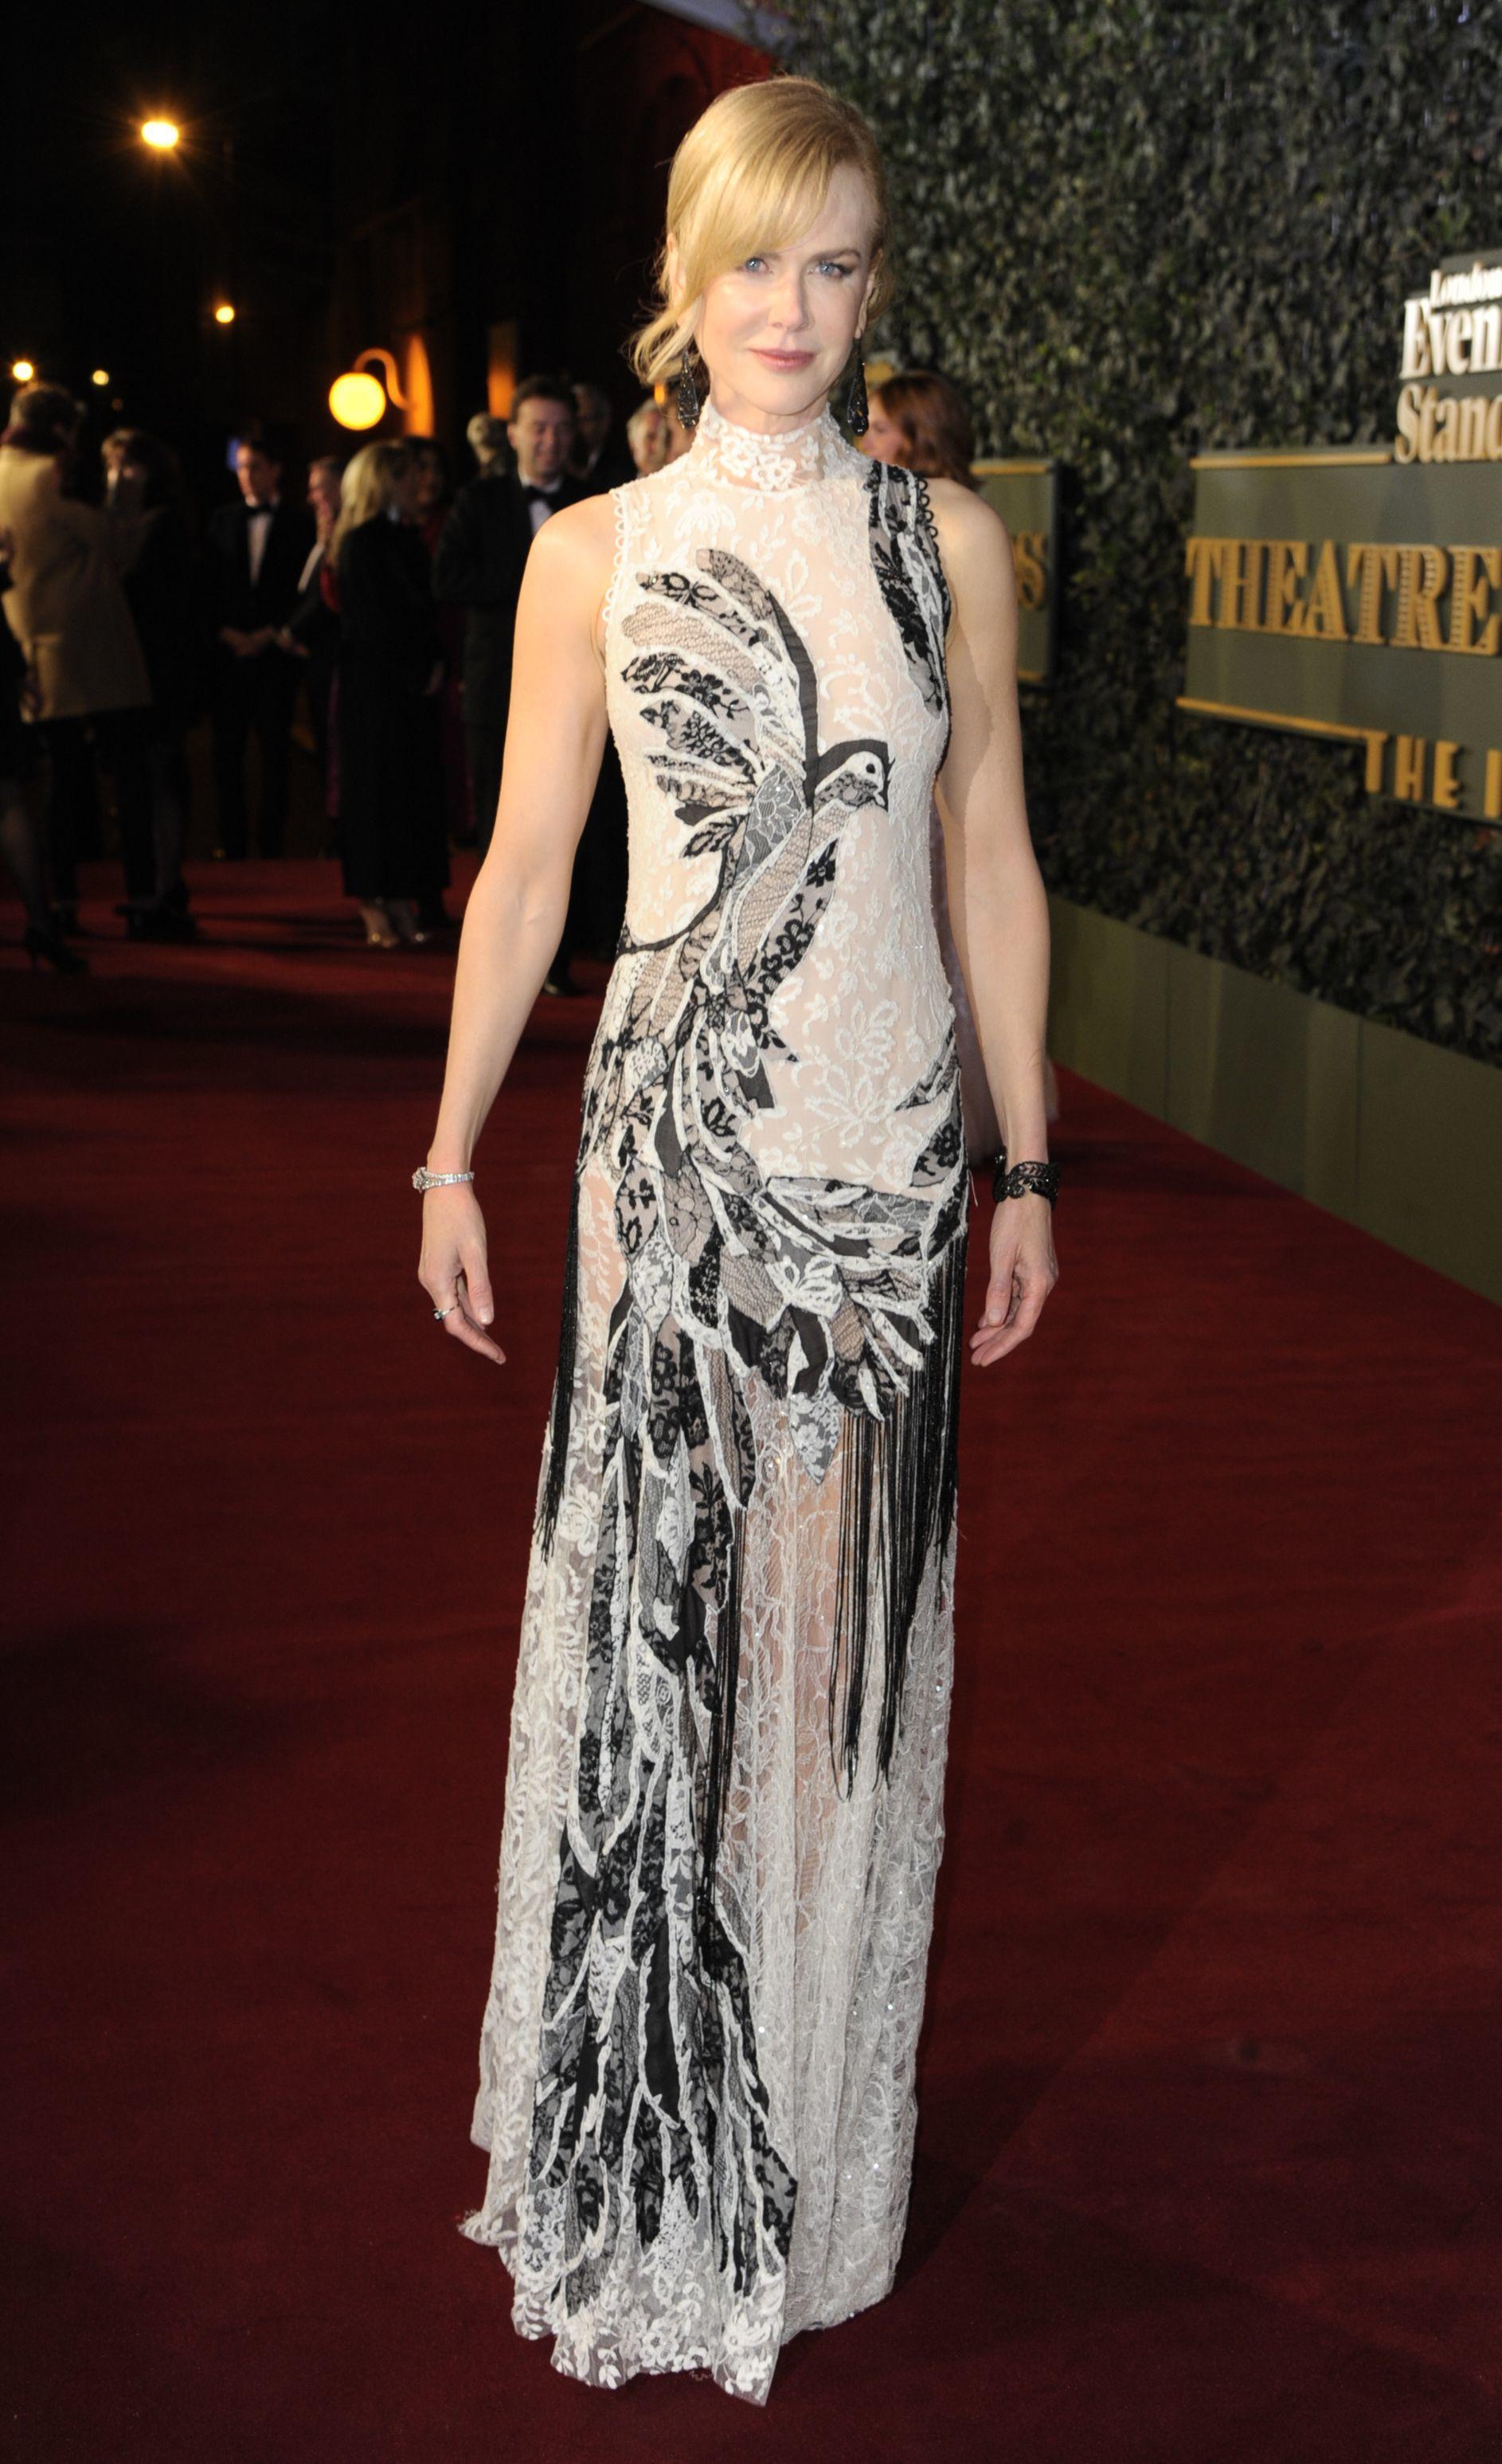 Nicole Kidman attends the Evening Standard Theatre Awards in London on Nov. 22, 2015.